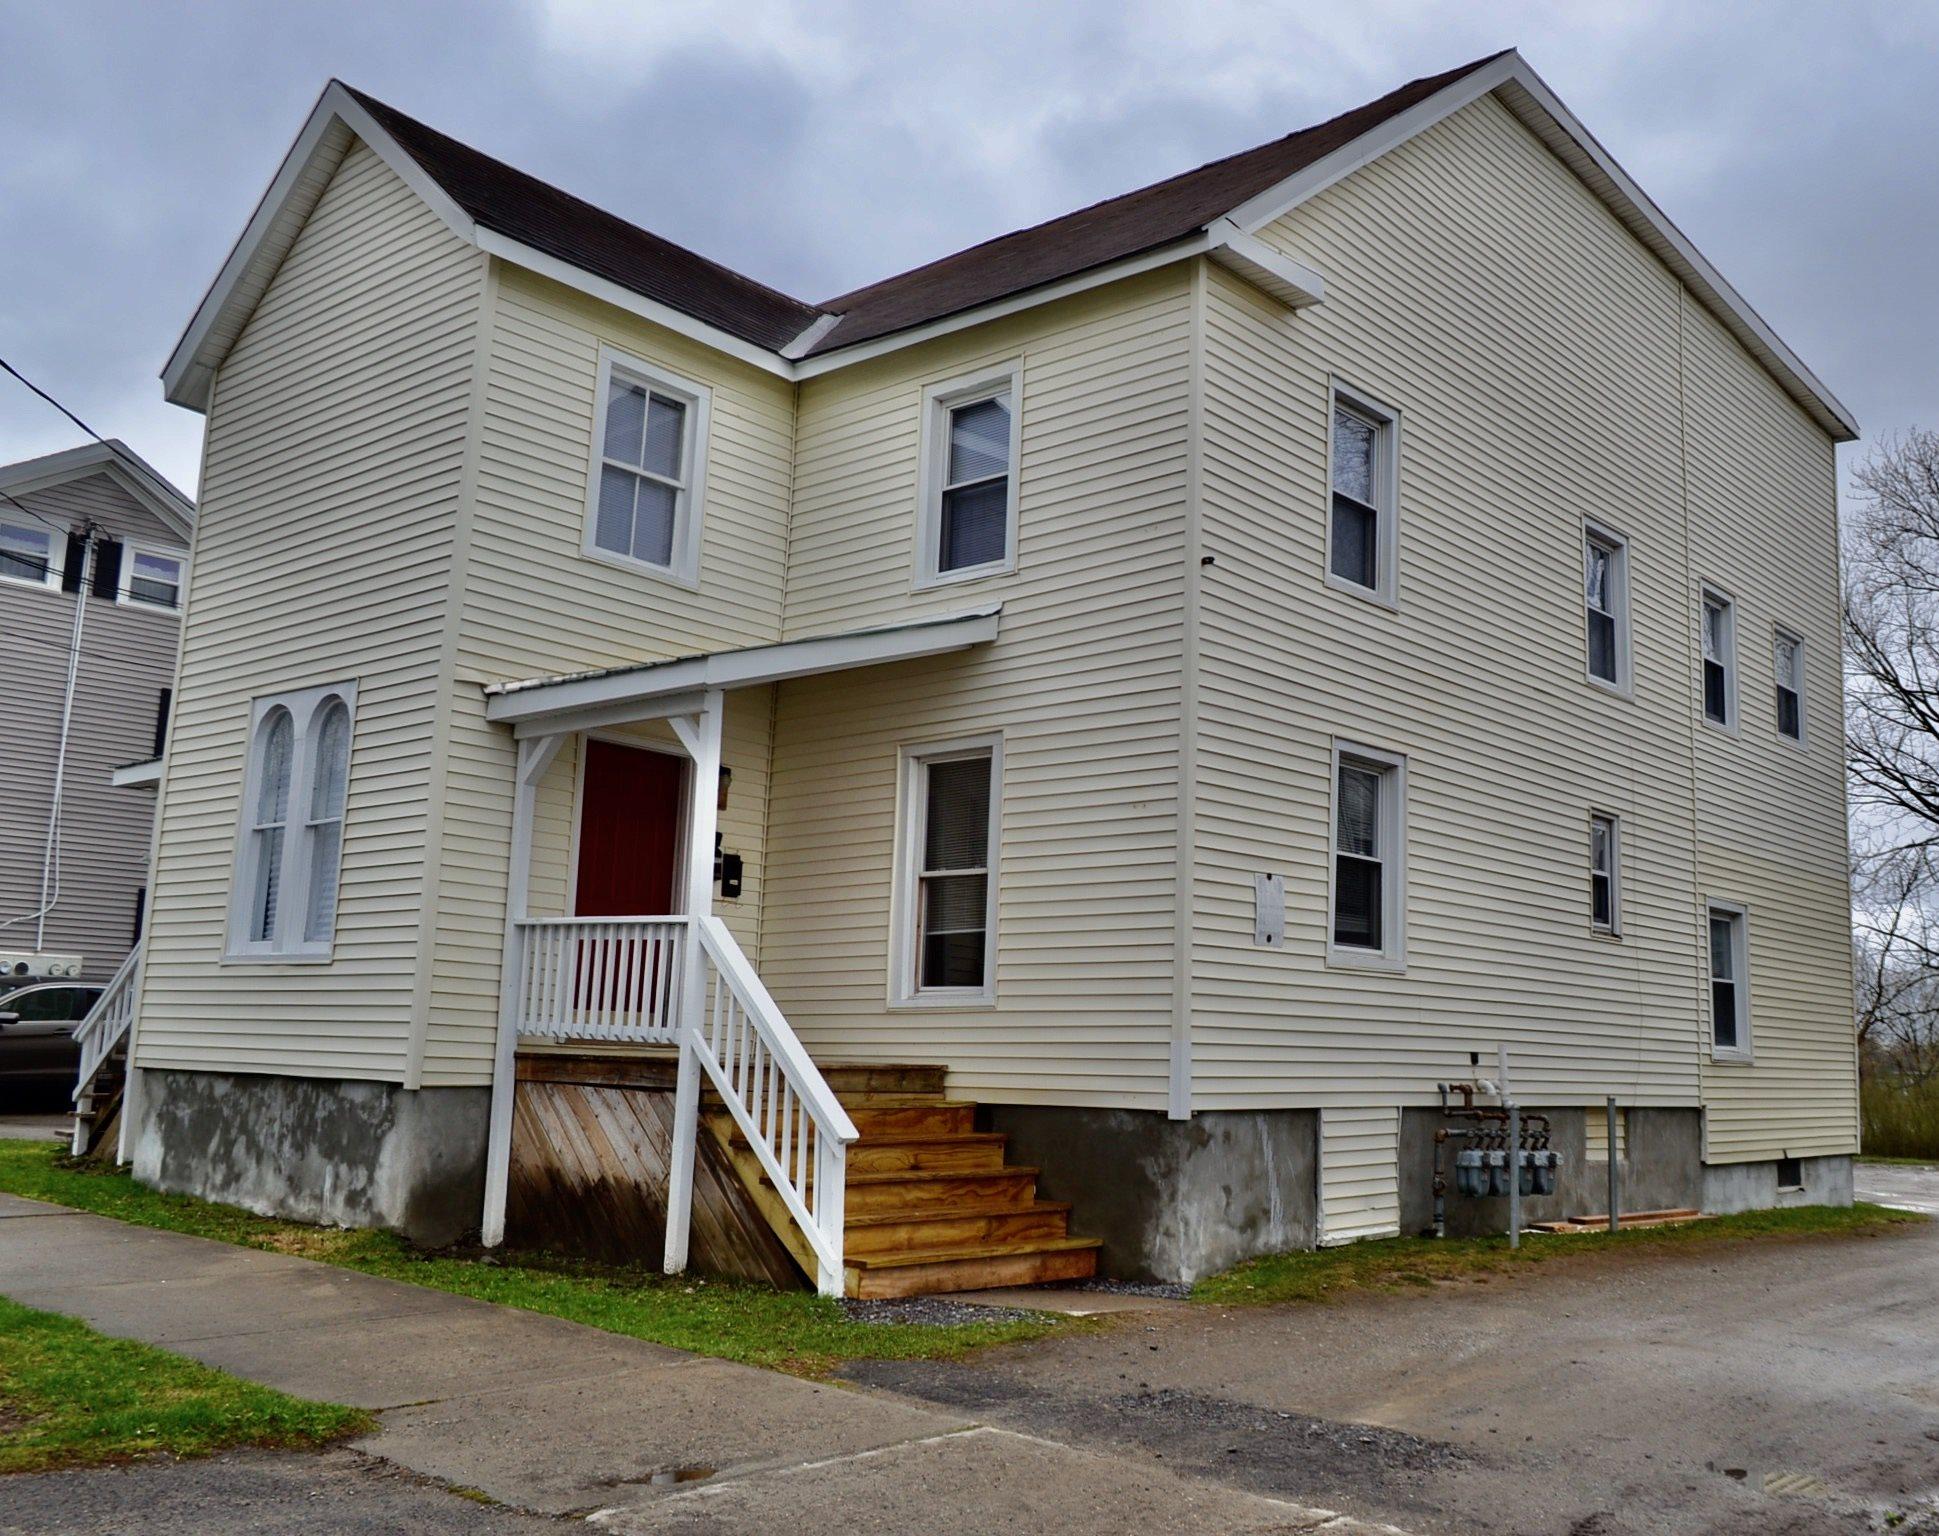 Johnstown image 40